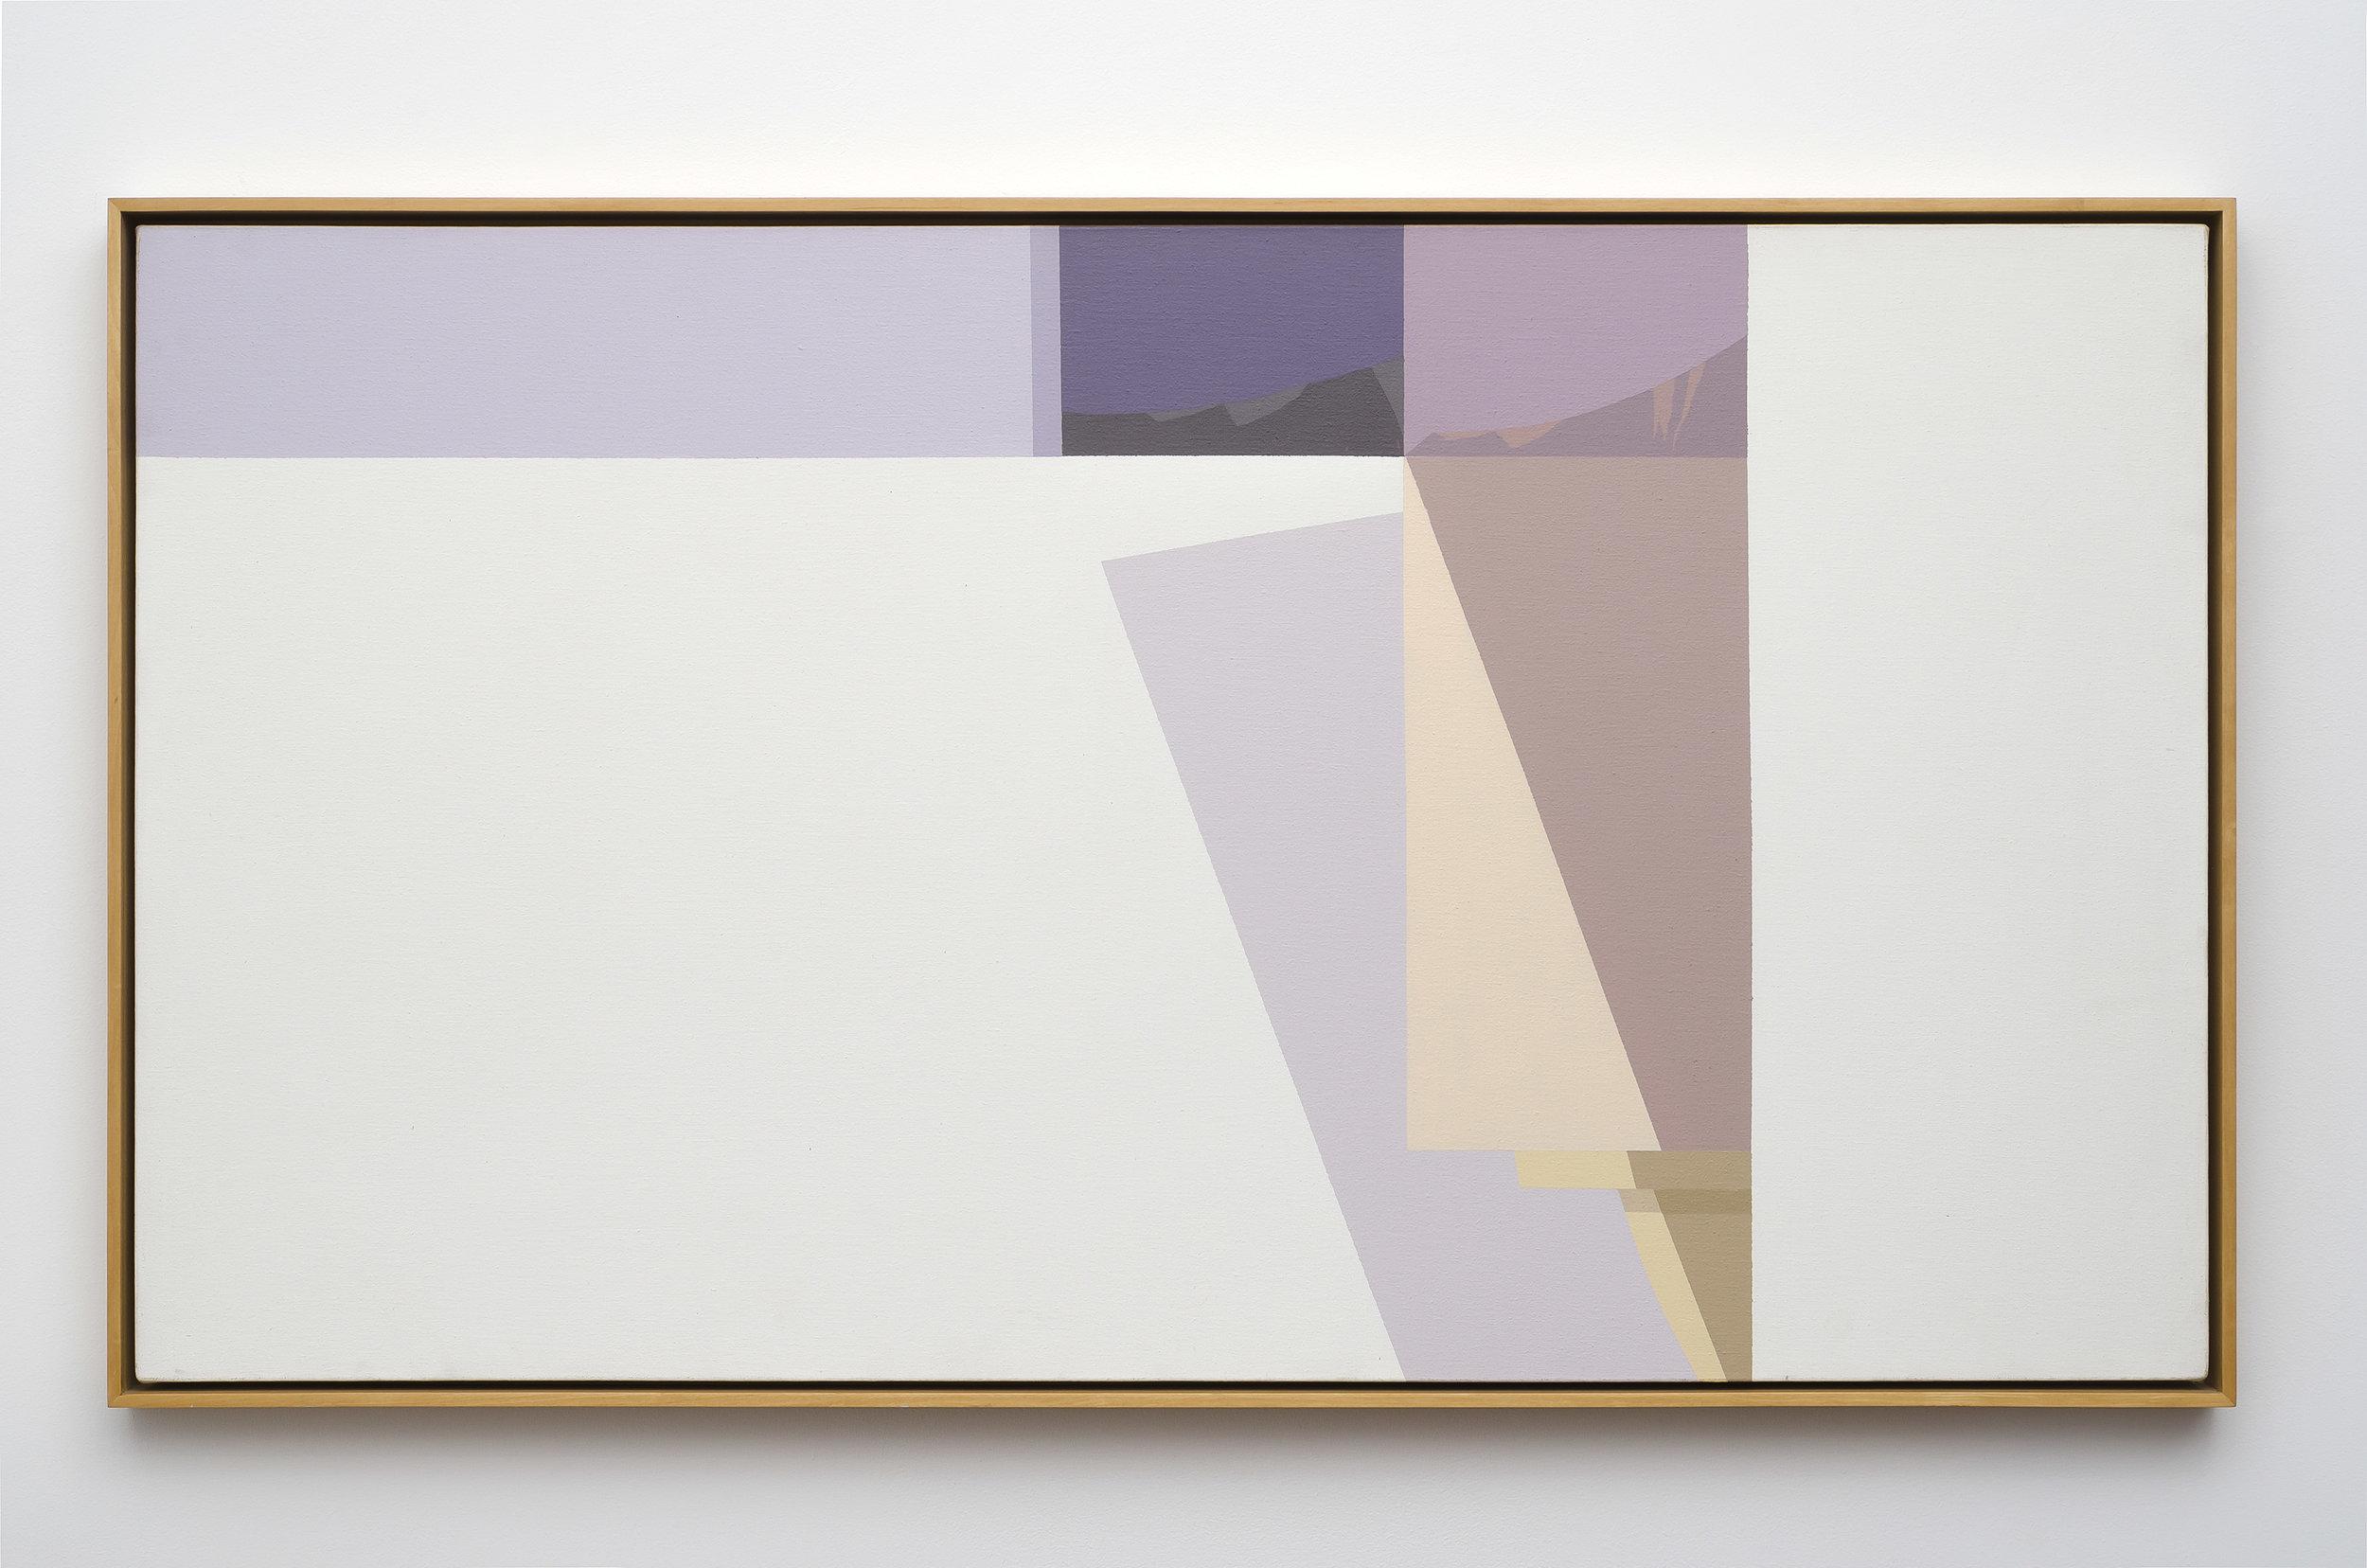 Studio Interior , 1980  acrylic on canvas 30 x 54 inches; 76.2 x 137.2 centimeters